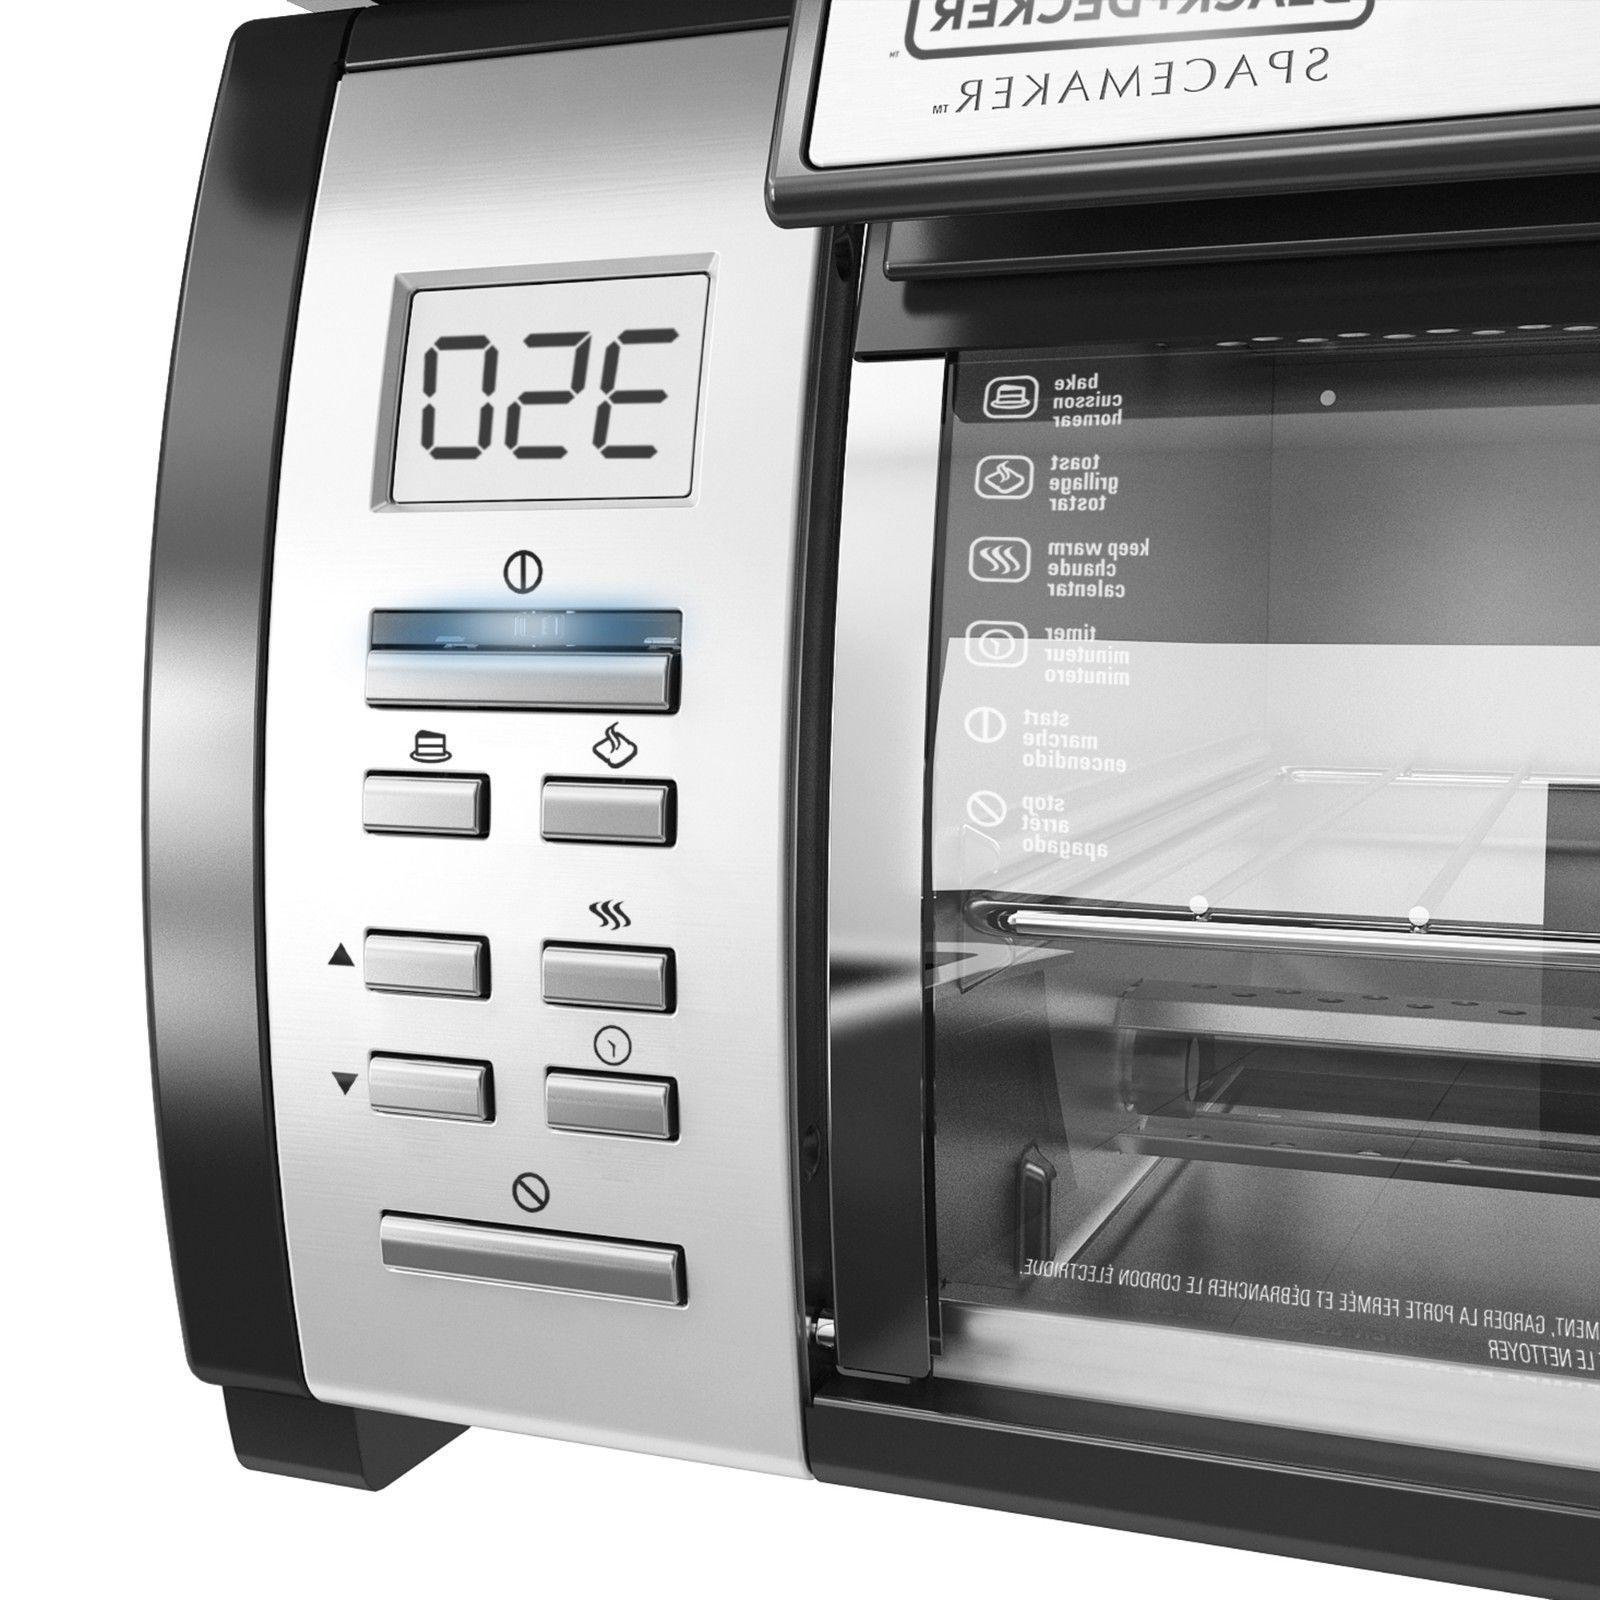 Space Oven Digital Kitchen Timer